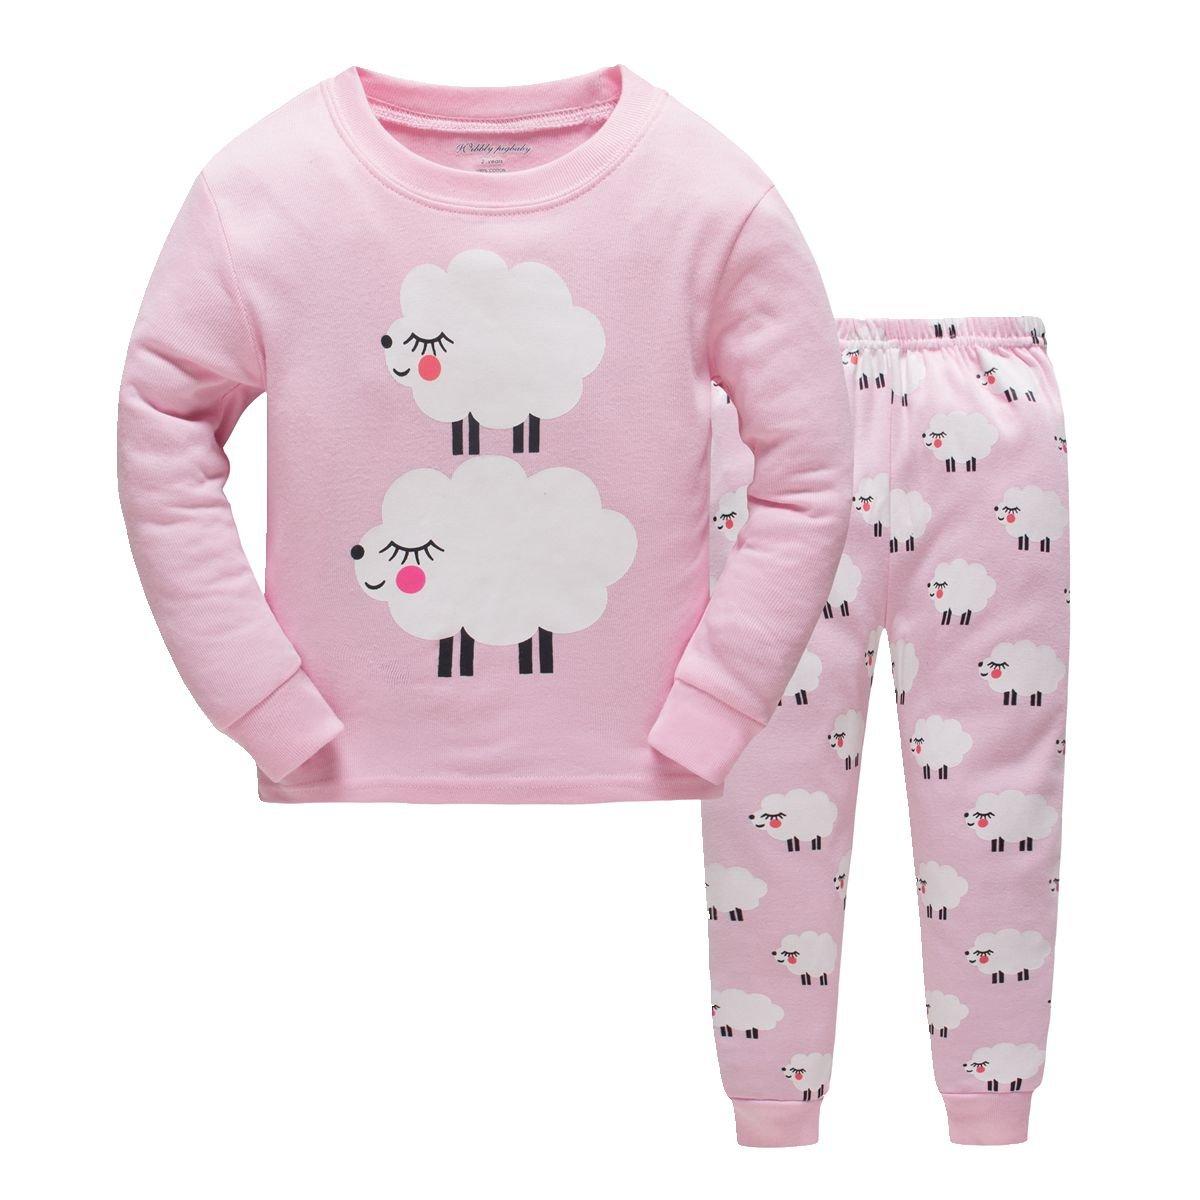 Girls Pajamas Cosy Cotton Long Sleeves Toddler Cute Sheep Pjs Sleepwear 2 Piece Yzjcafriz